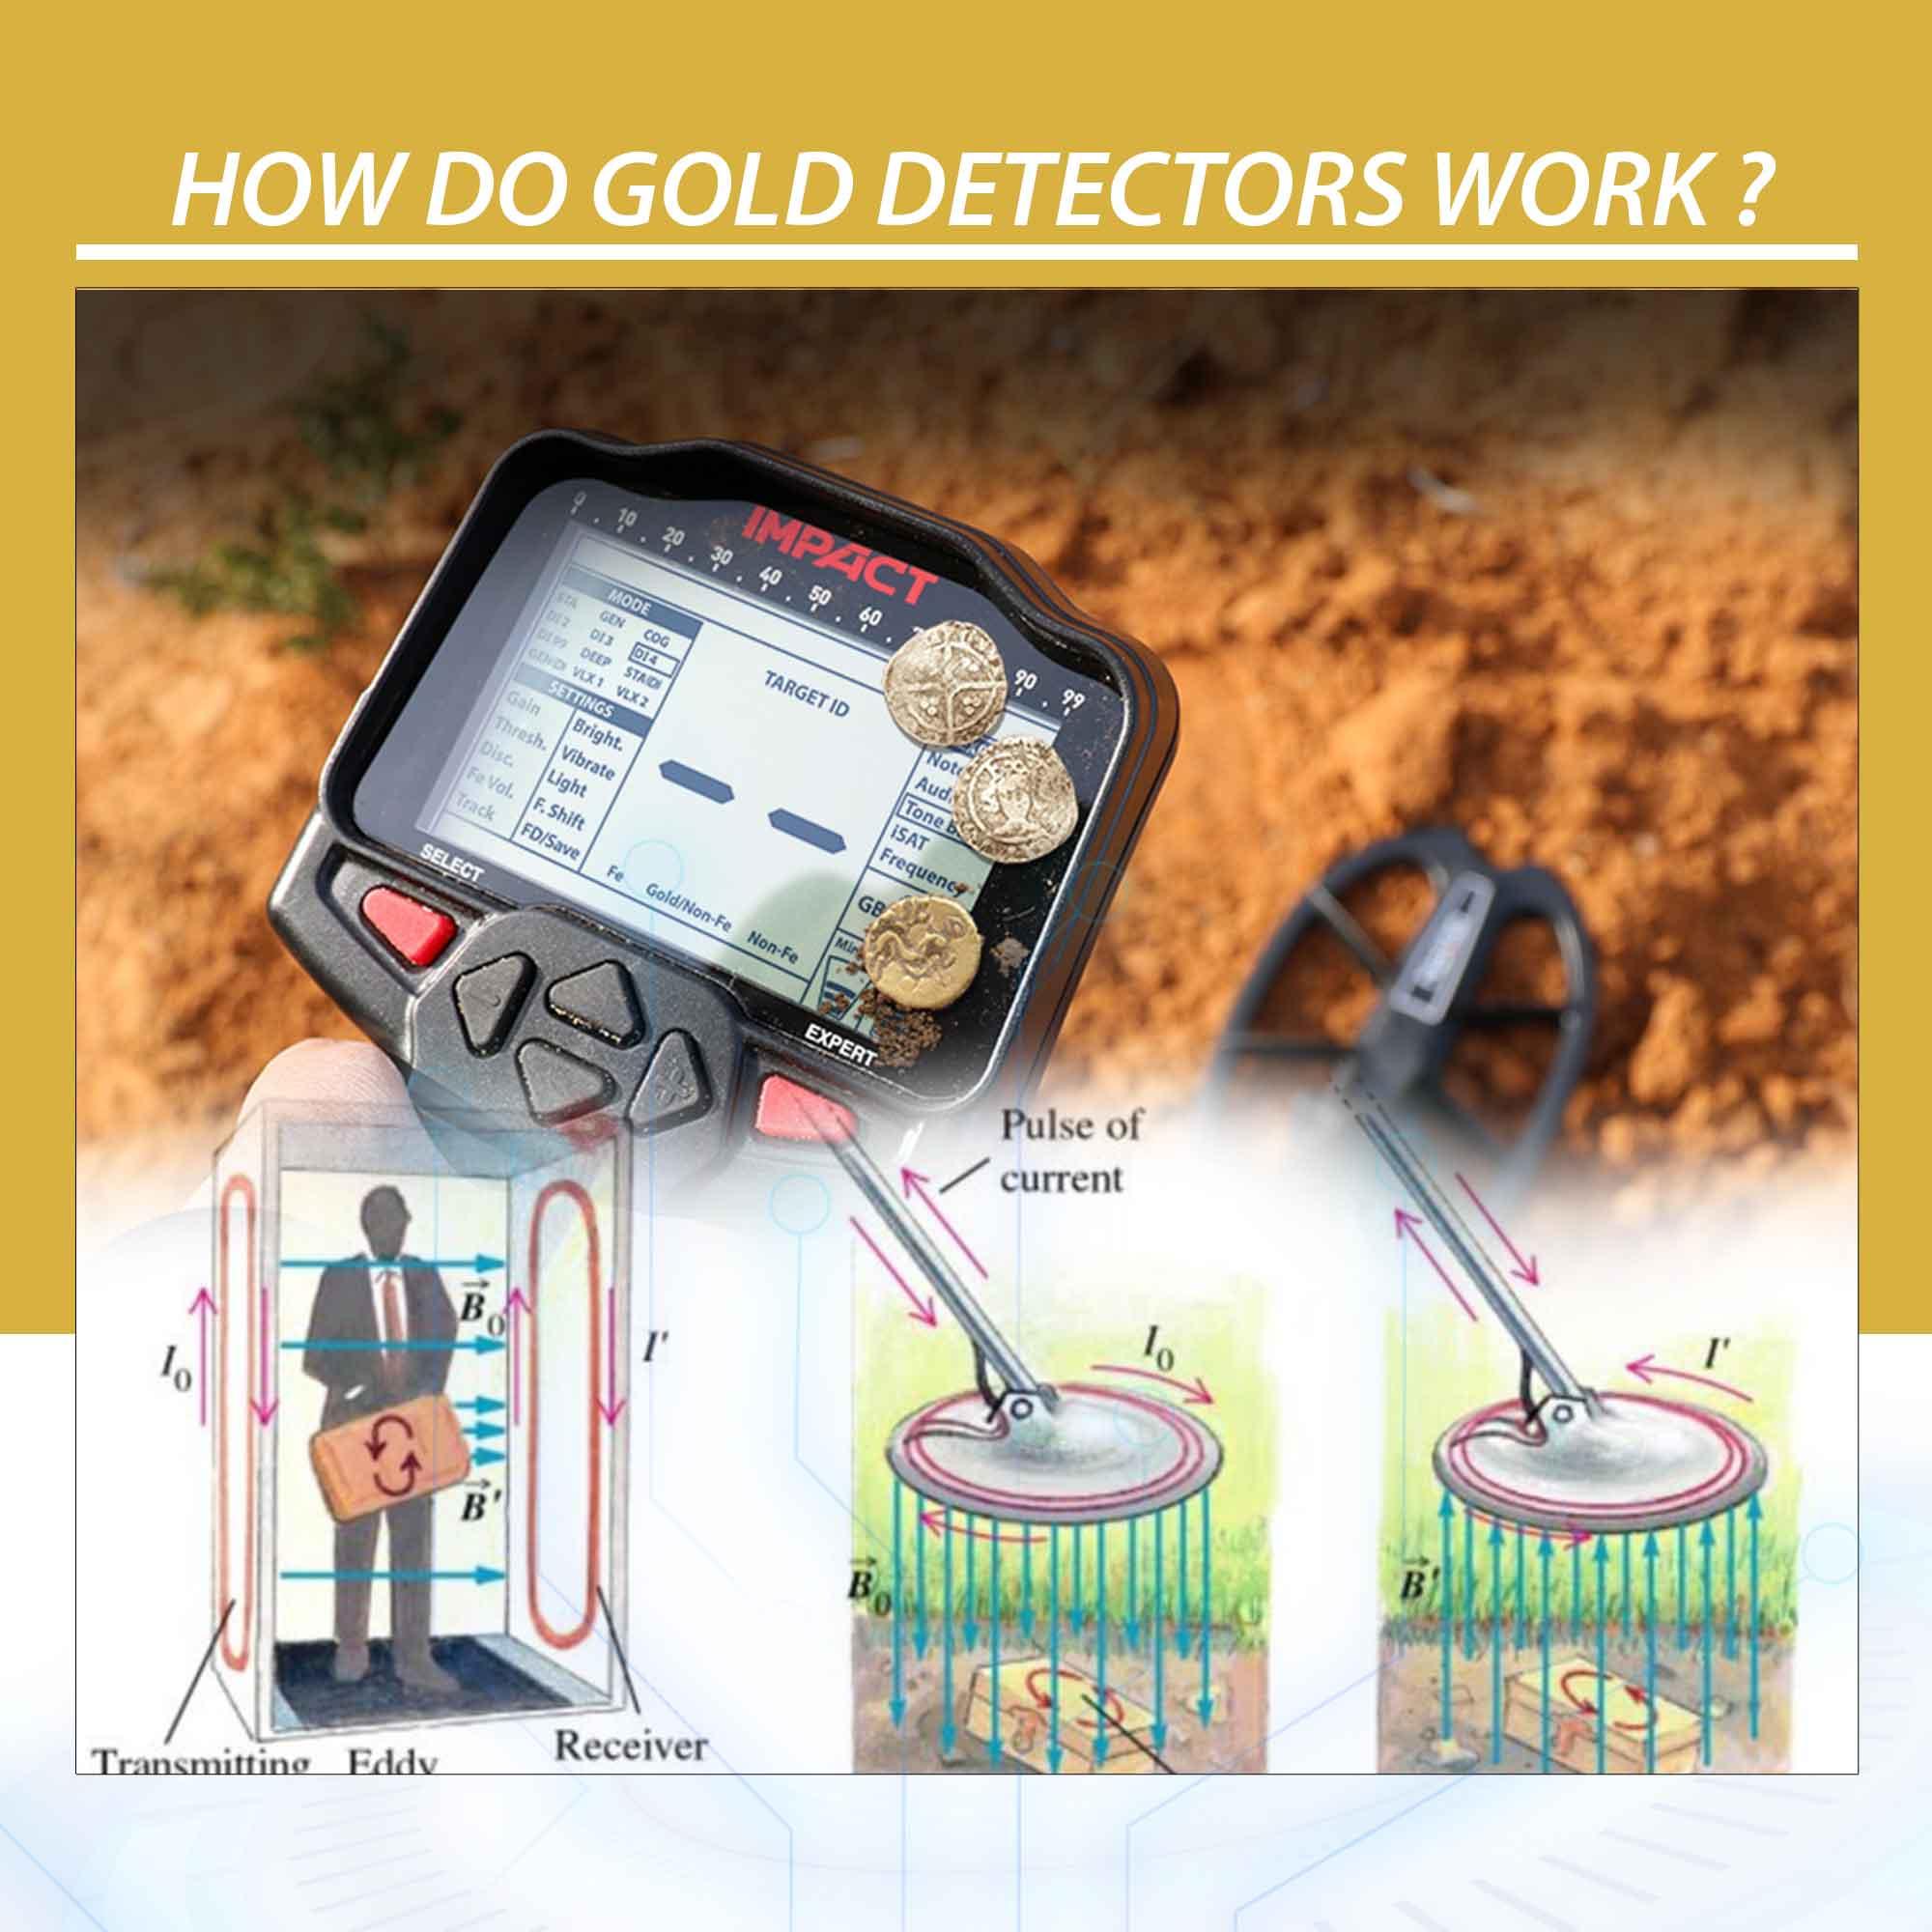 How Do Gold Detectors Work